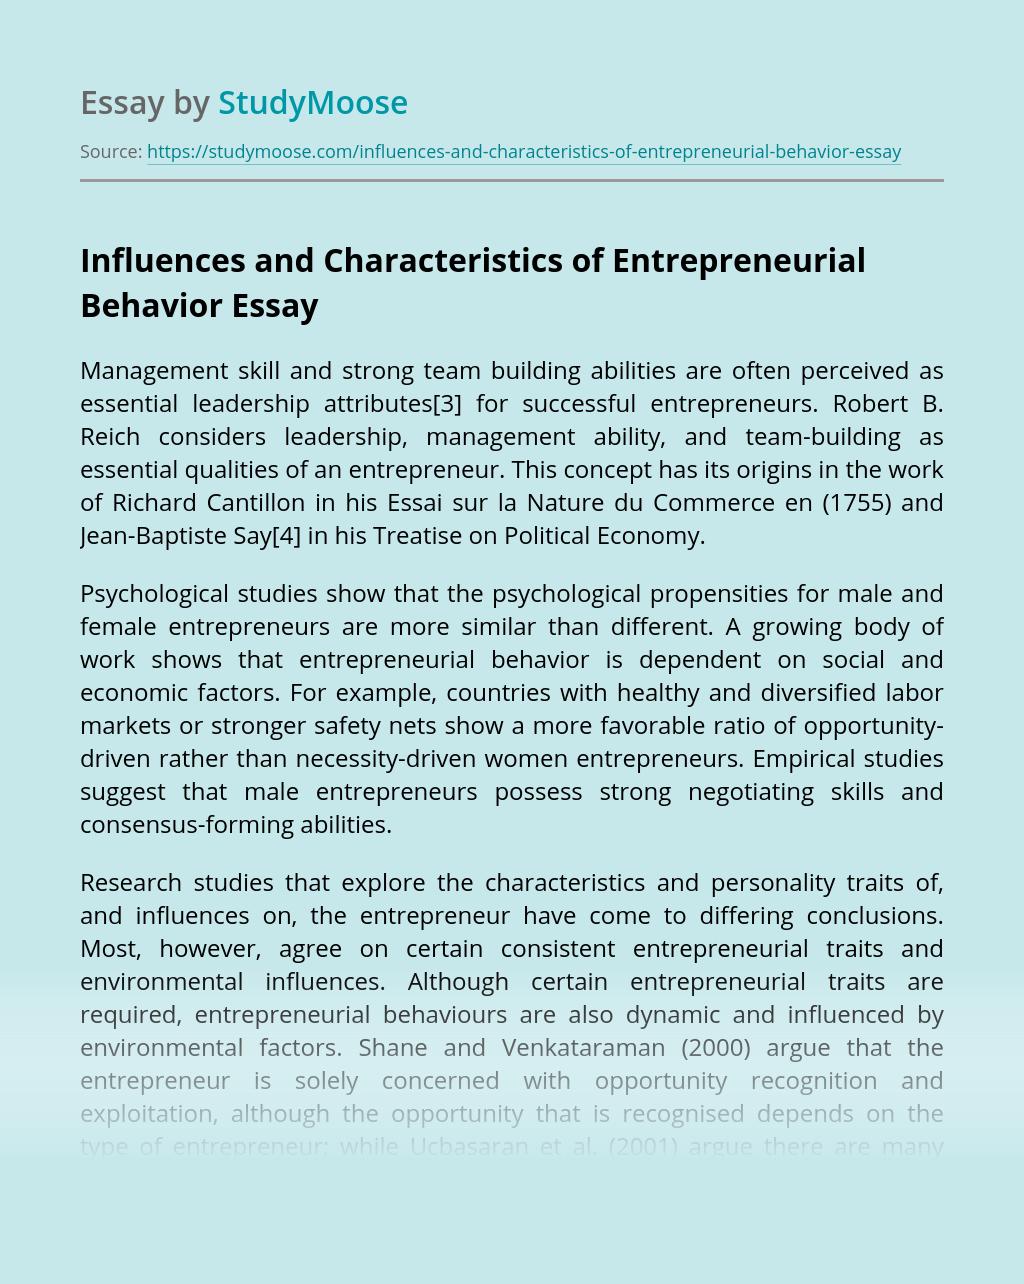 Influences and Characteristics of Entrepreneurial Behavior